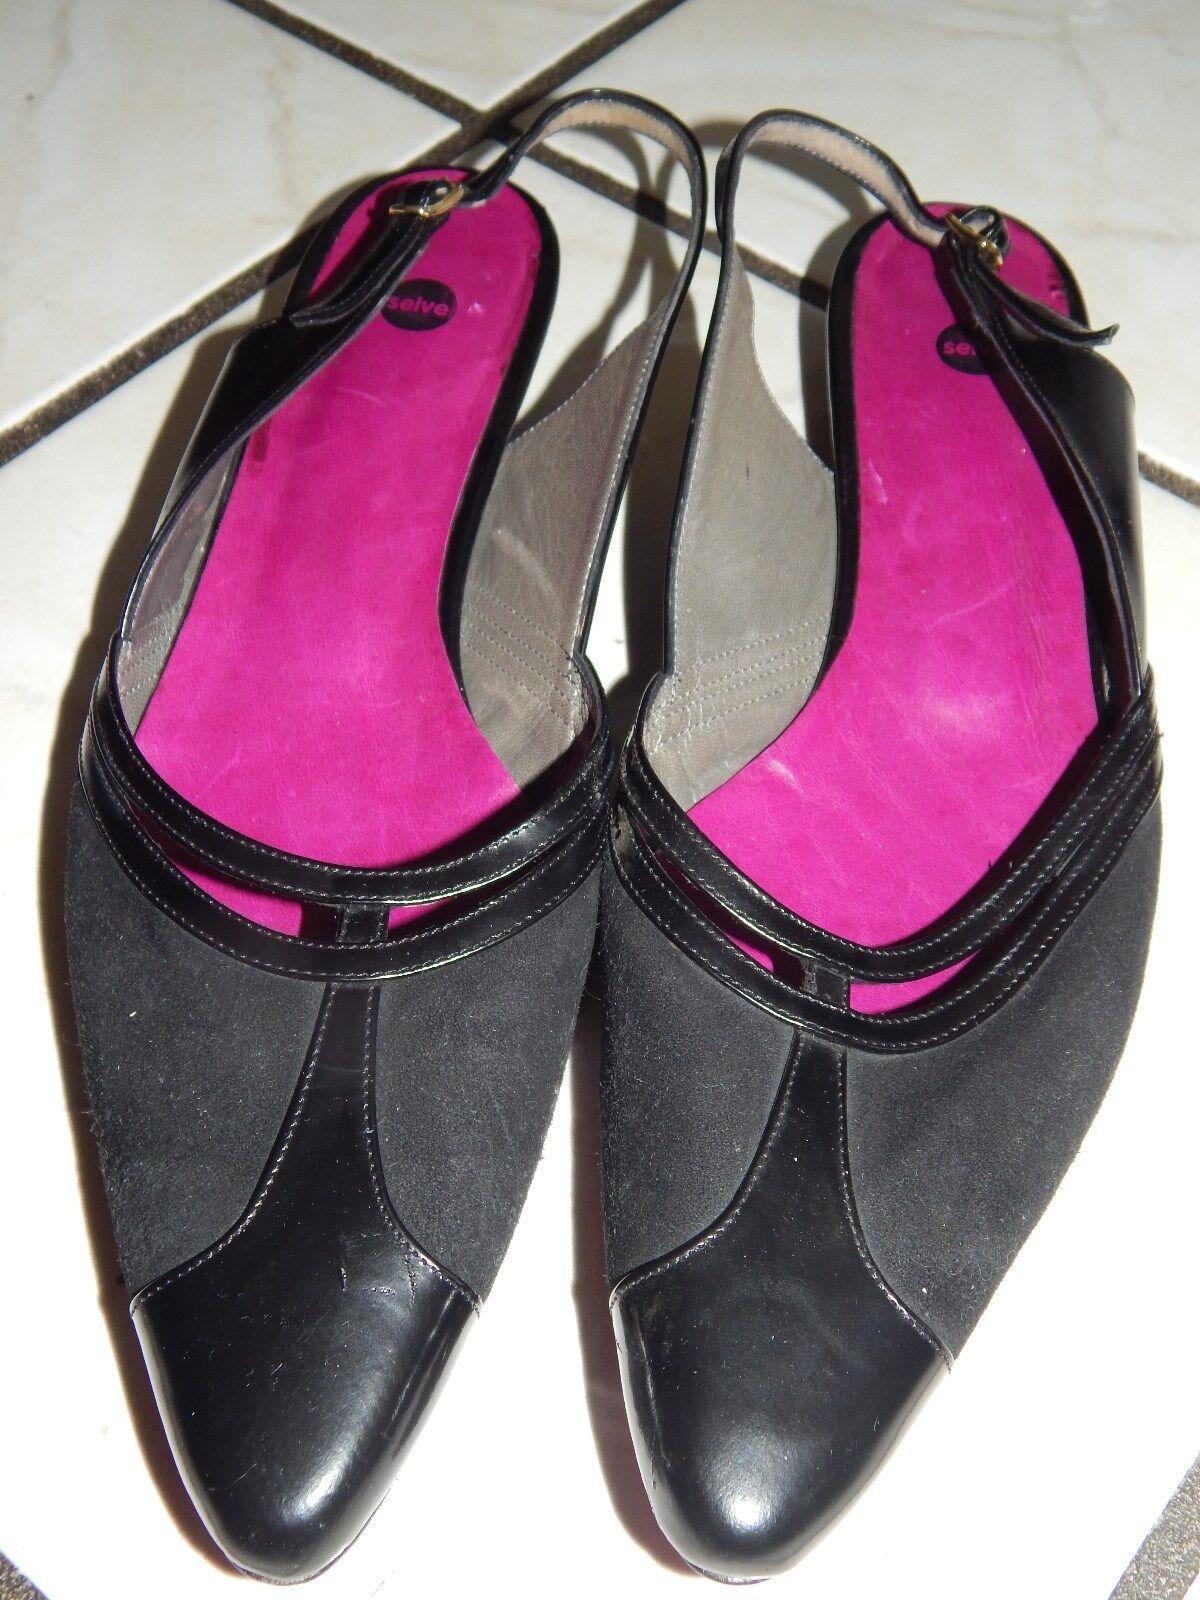 SELVE Loafers Mokassins Handmade Halbschuhe Ballerinas Handmade Mokassins Gr. 41   Echt Leder (5) be48fe